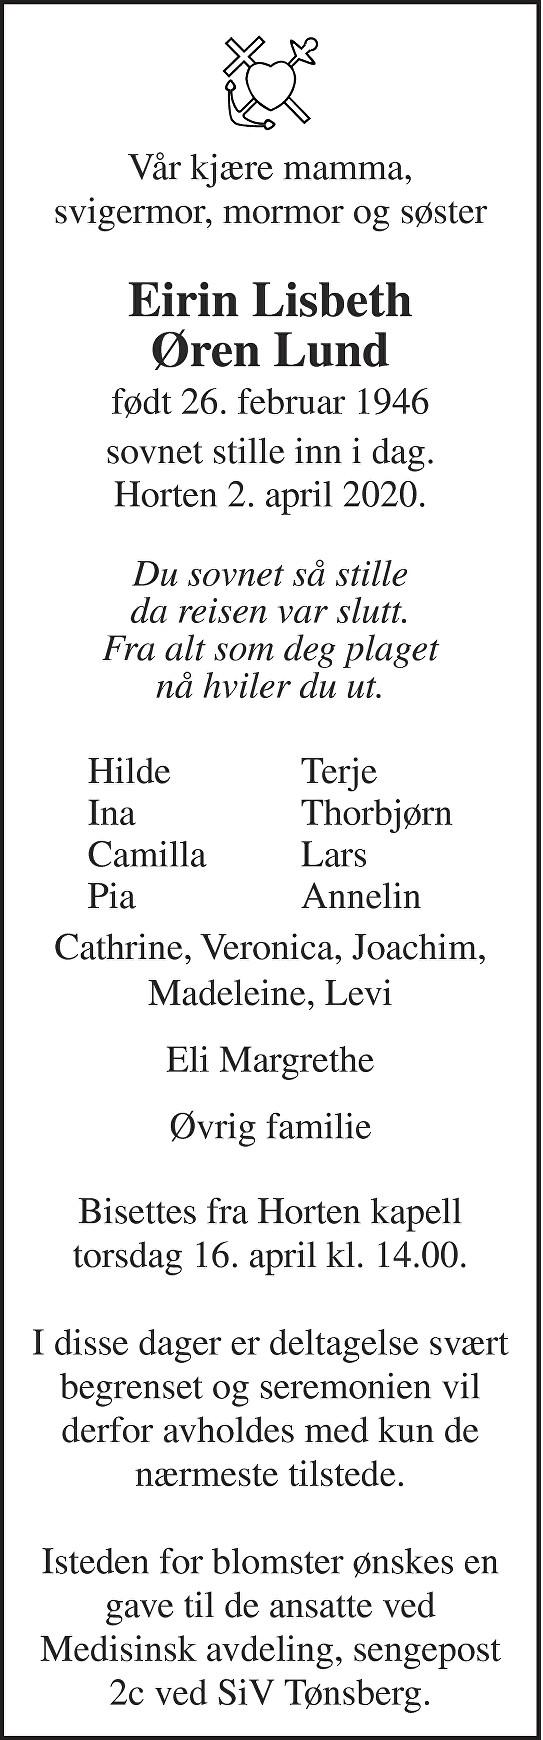 Eirin Lisbeth Øren Lund Dødsannonse